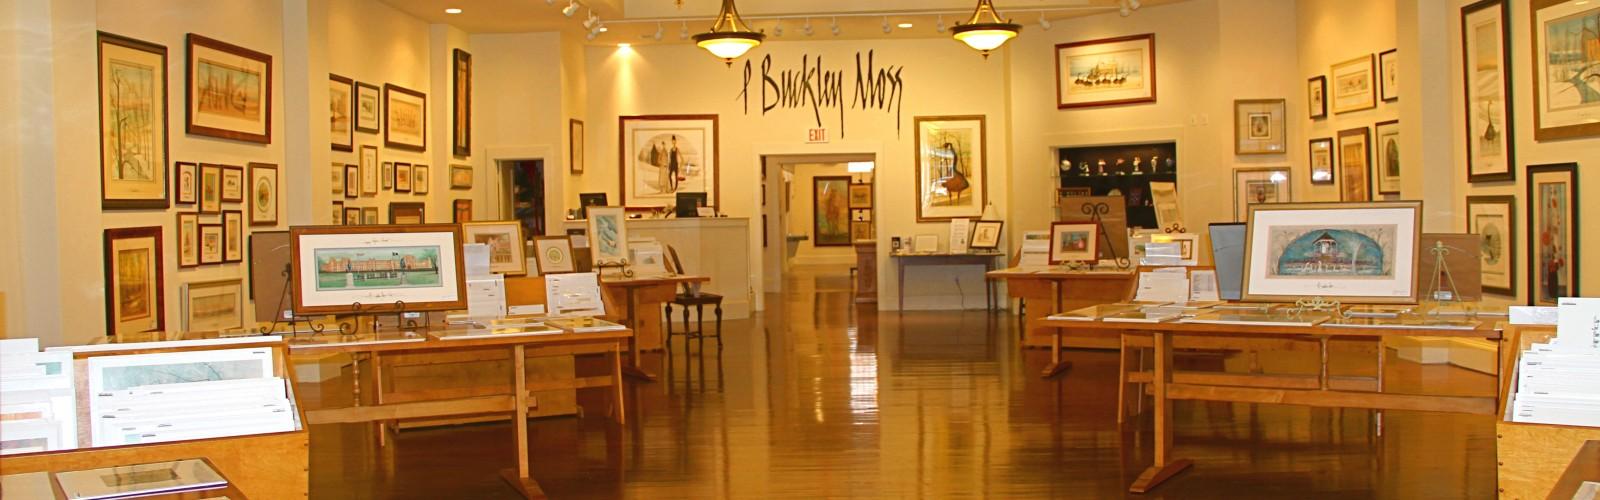 P. Buckley Moss Gallery Open House